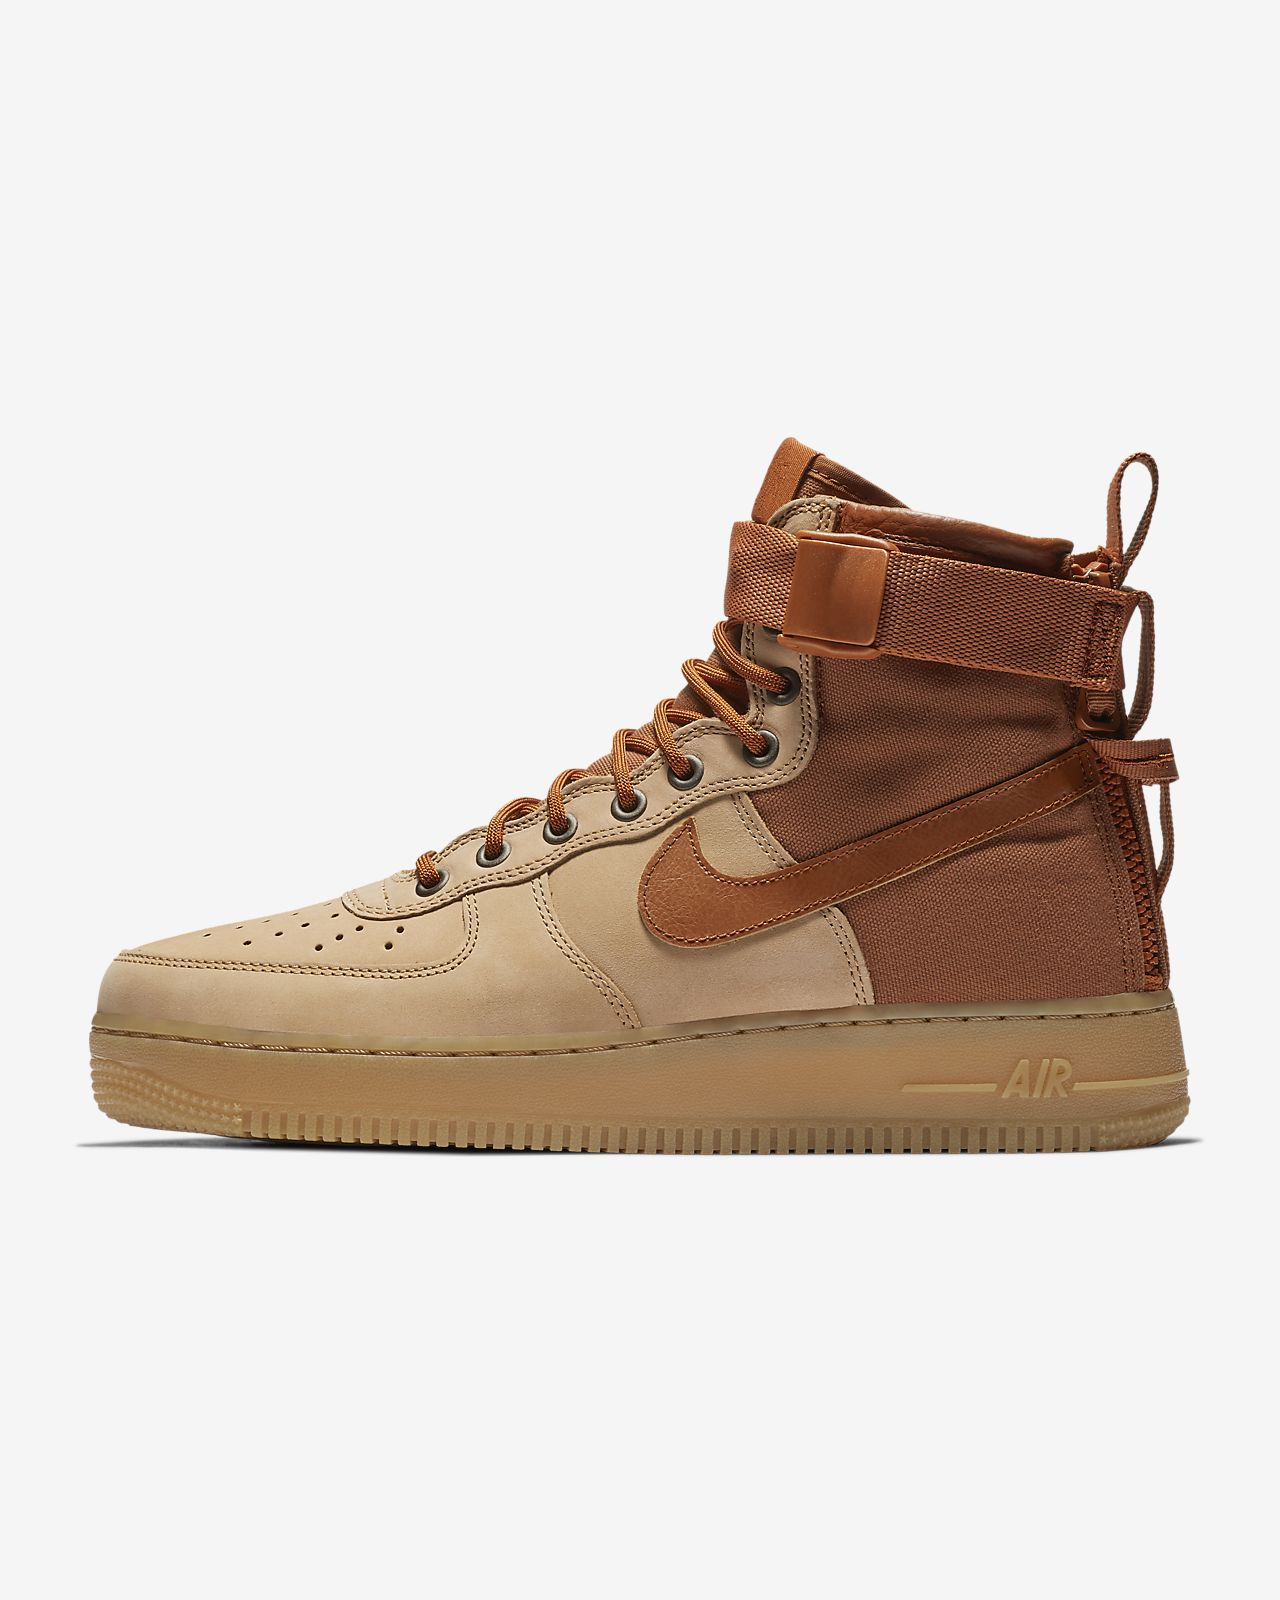 Chaussure Nike SF Air Force 1 Mid Premium pour Homme